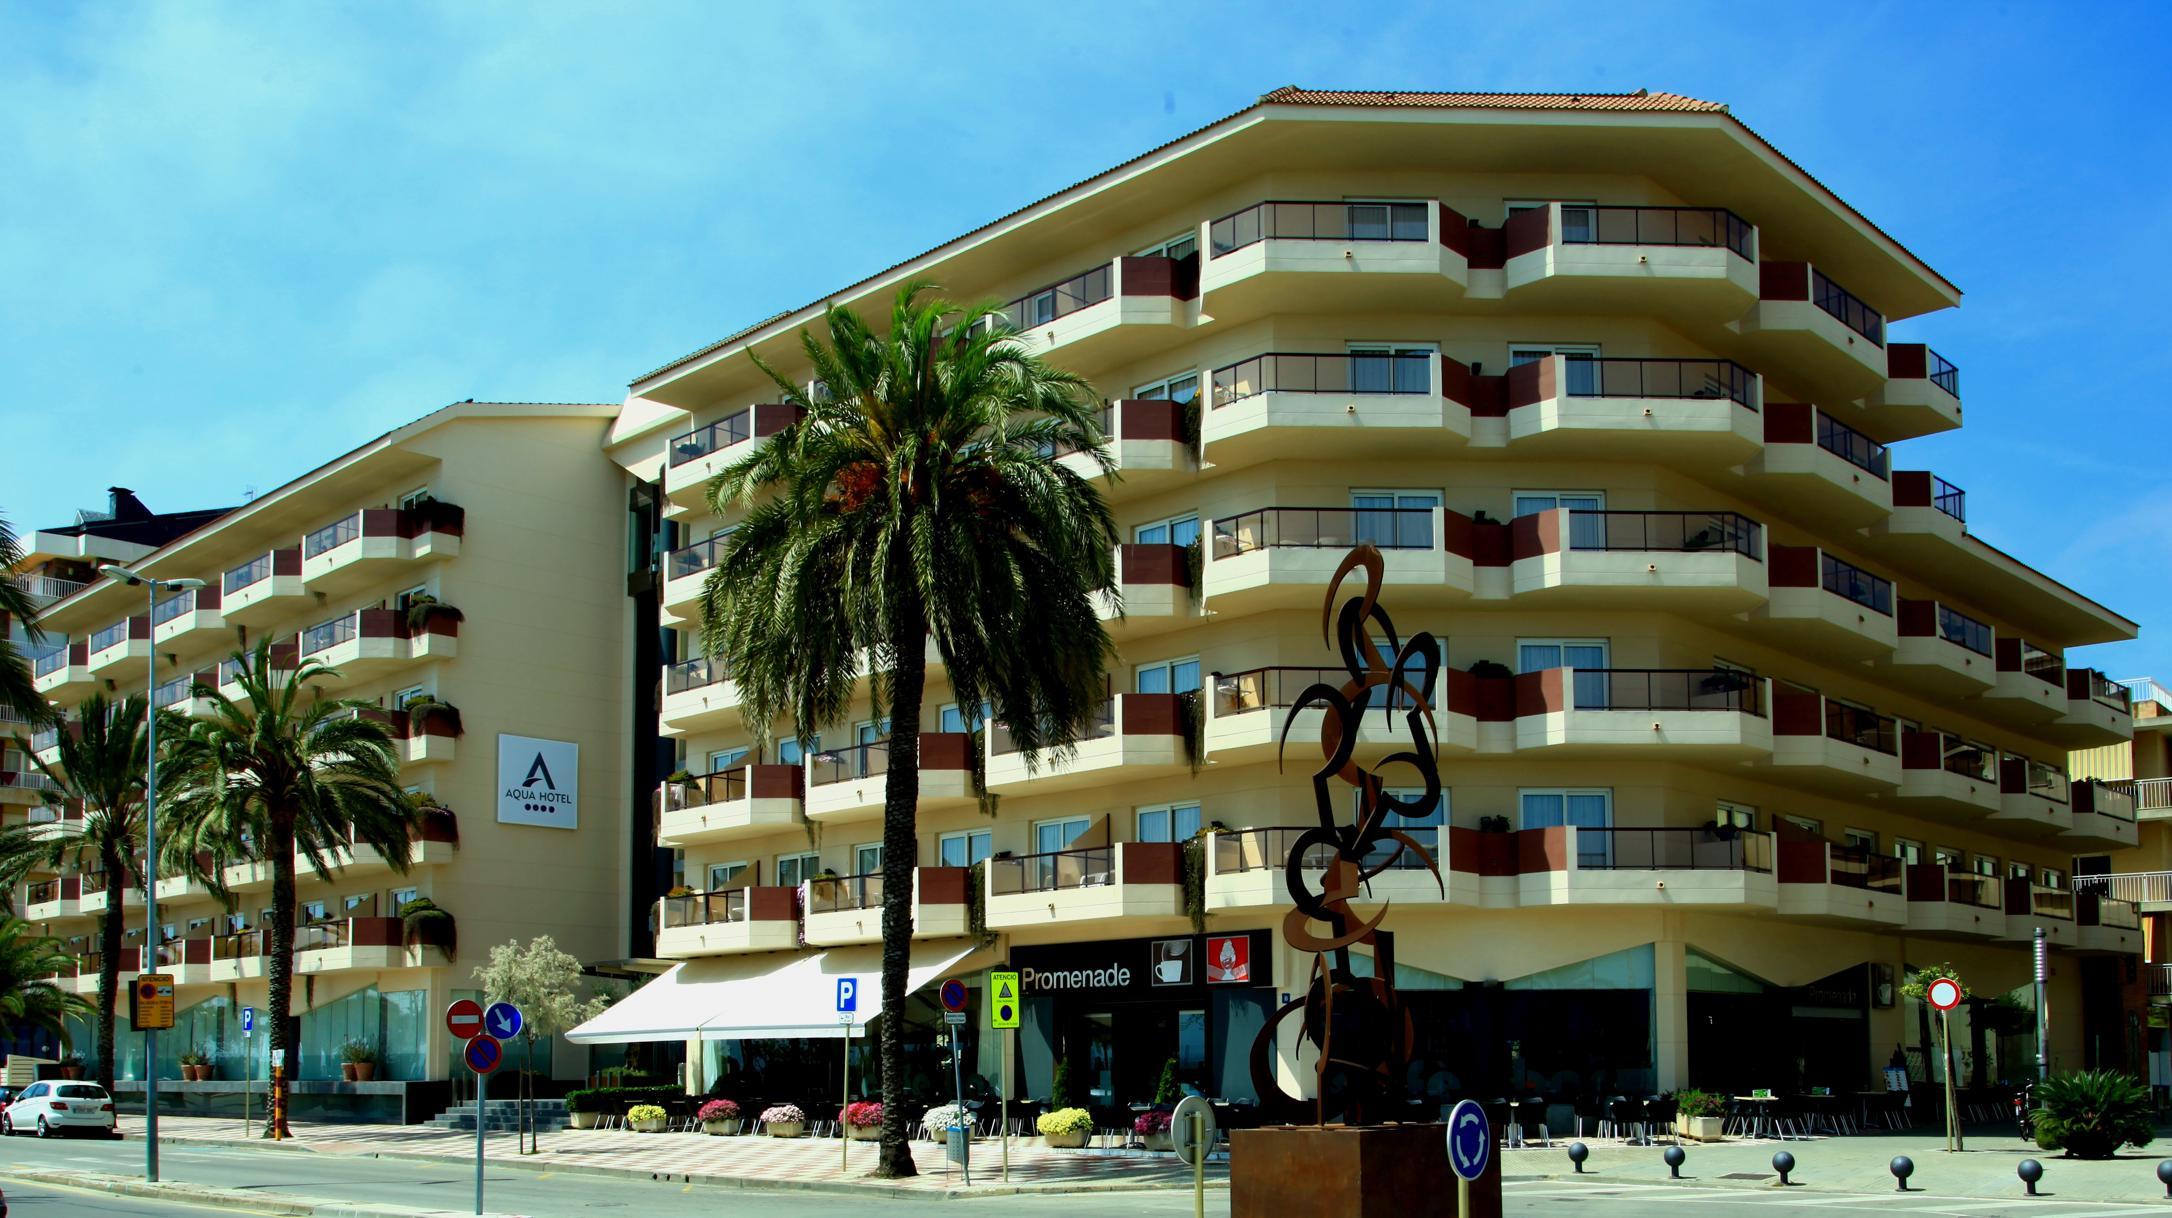 Aqua Hotel Promenade Costa Brava